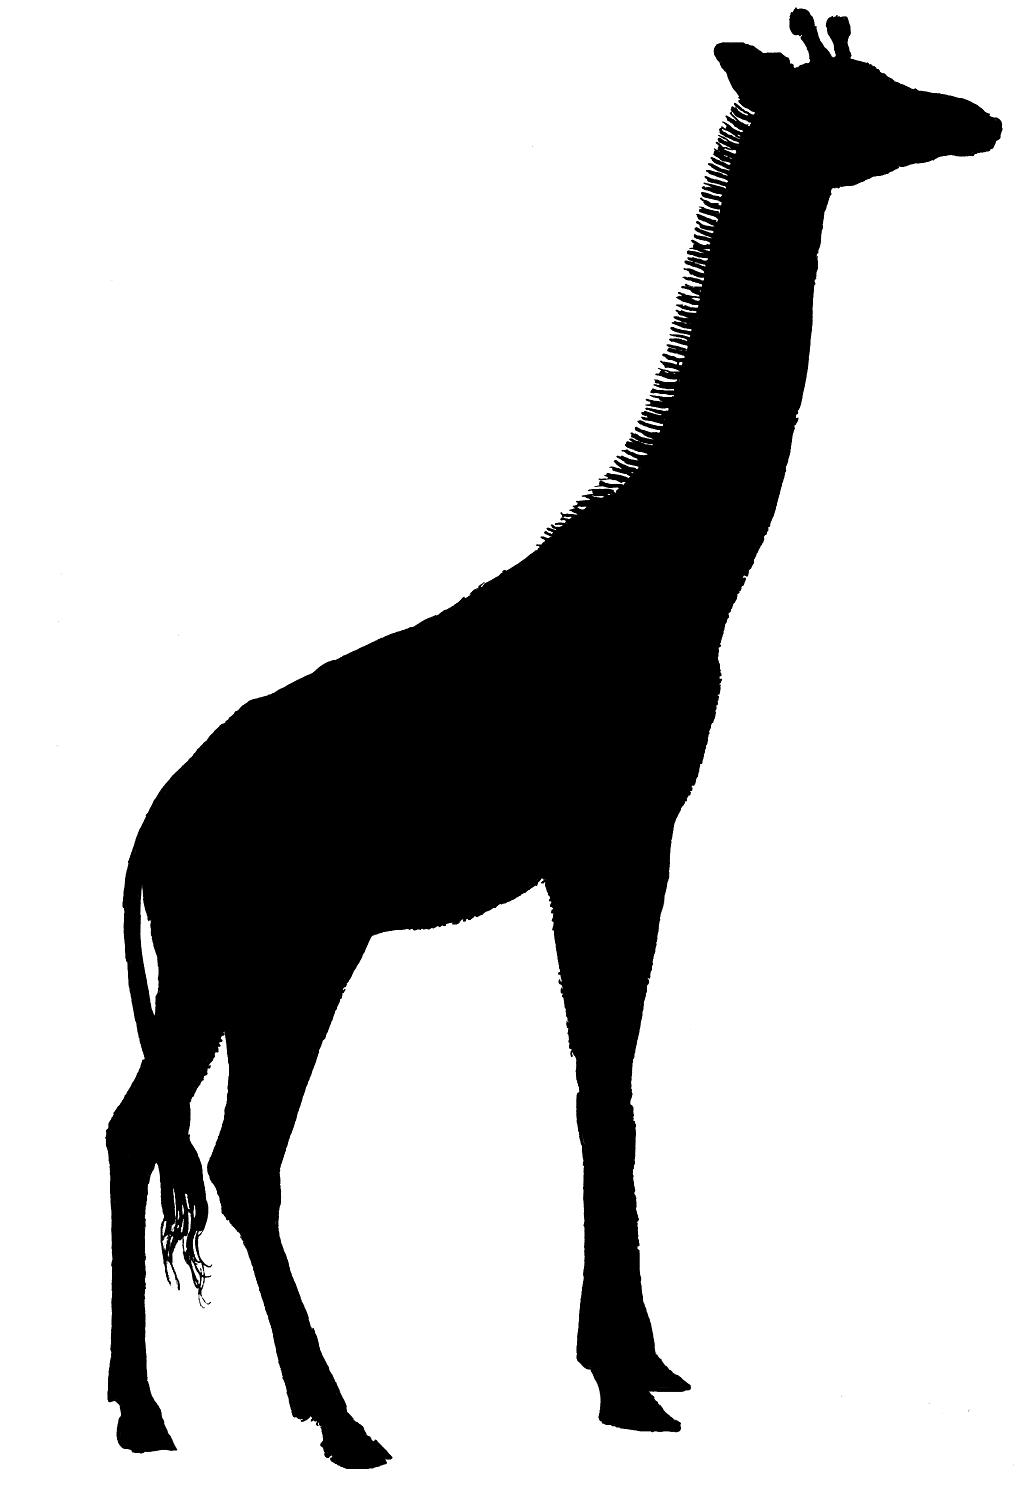 Giraffe Silhouette - ClipArt Best